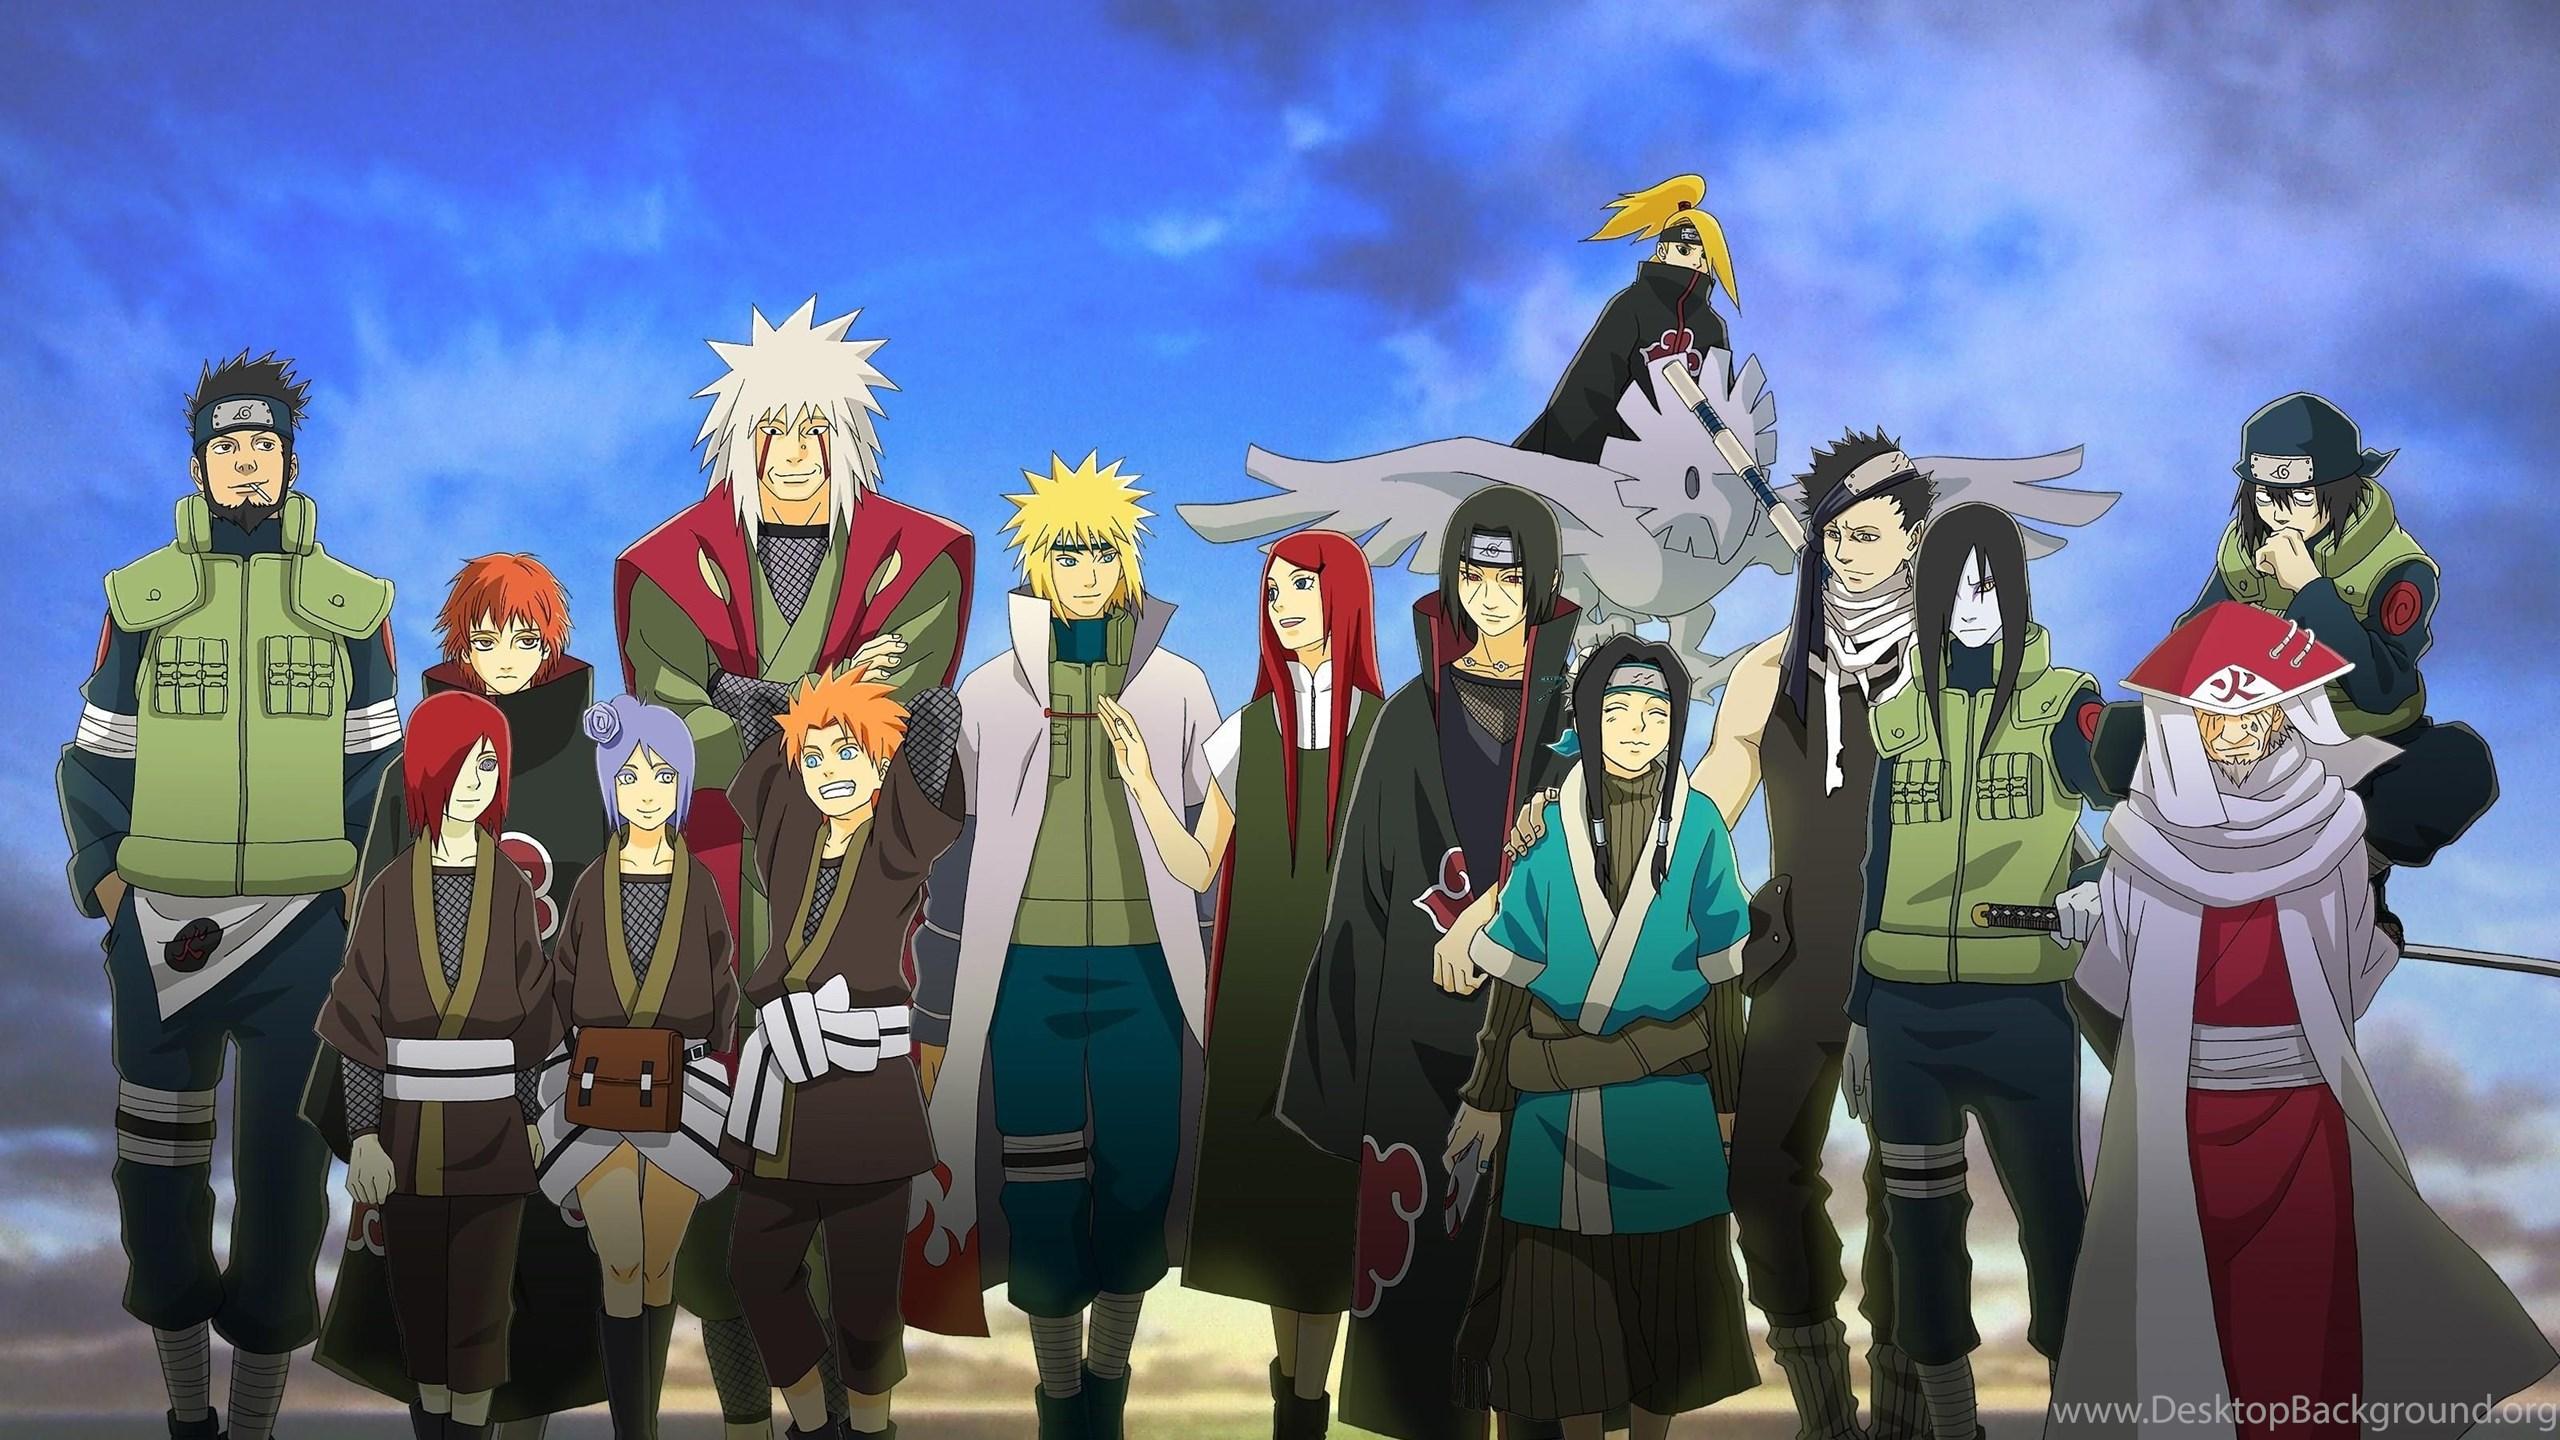 Simple Wallpaper Naruto Desktop - 379257_wallpapers-naruto-shippuden-characters-family-desktop-wallpapers_3206x1811_h  Perfect Image Reference_78268.jpg